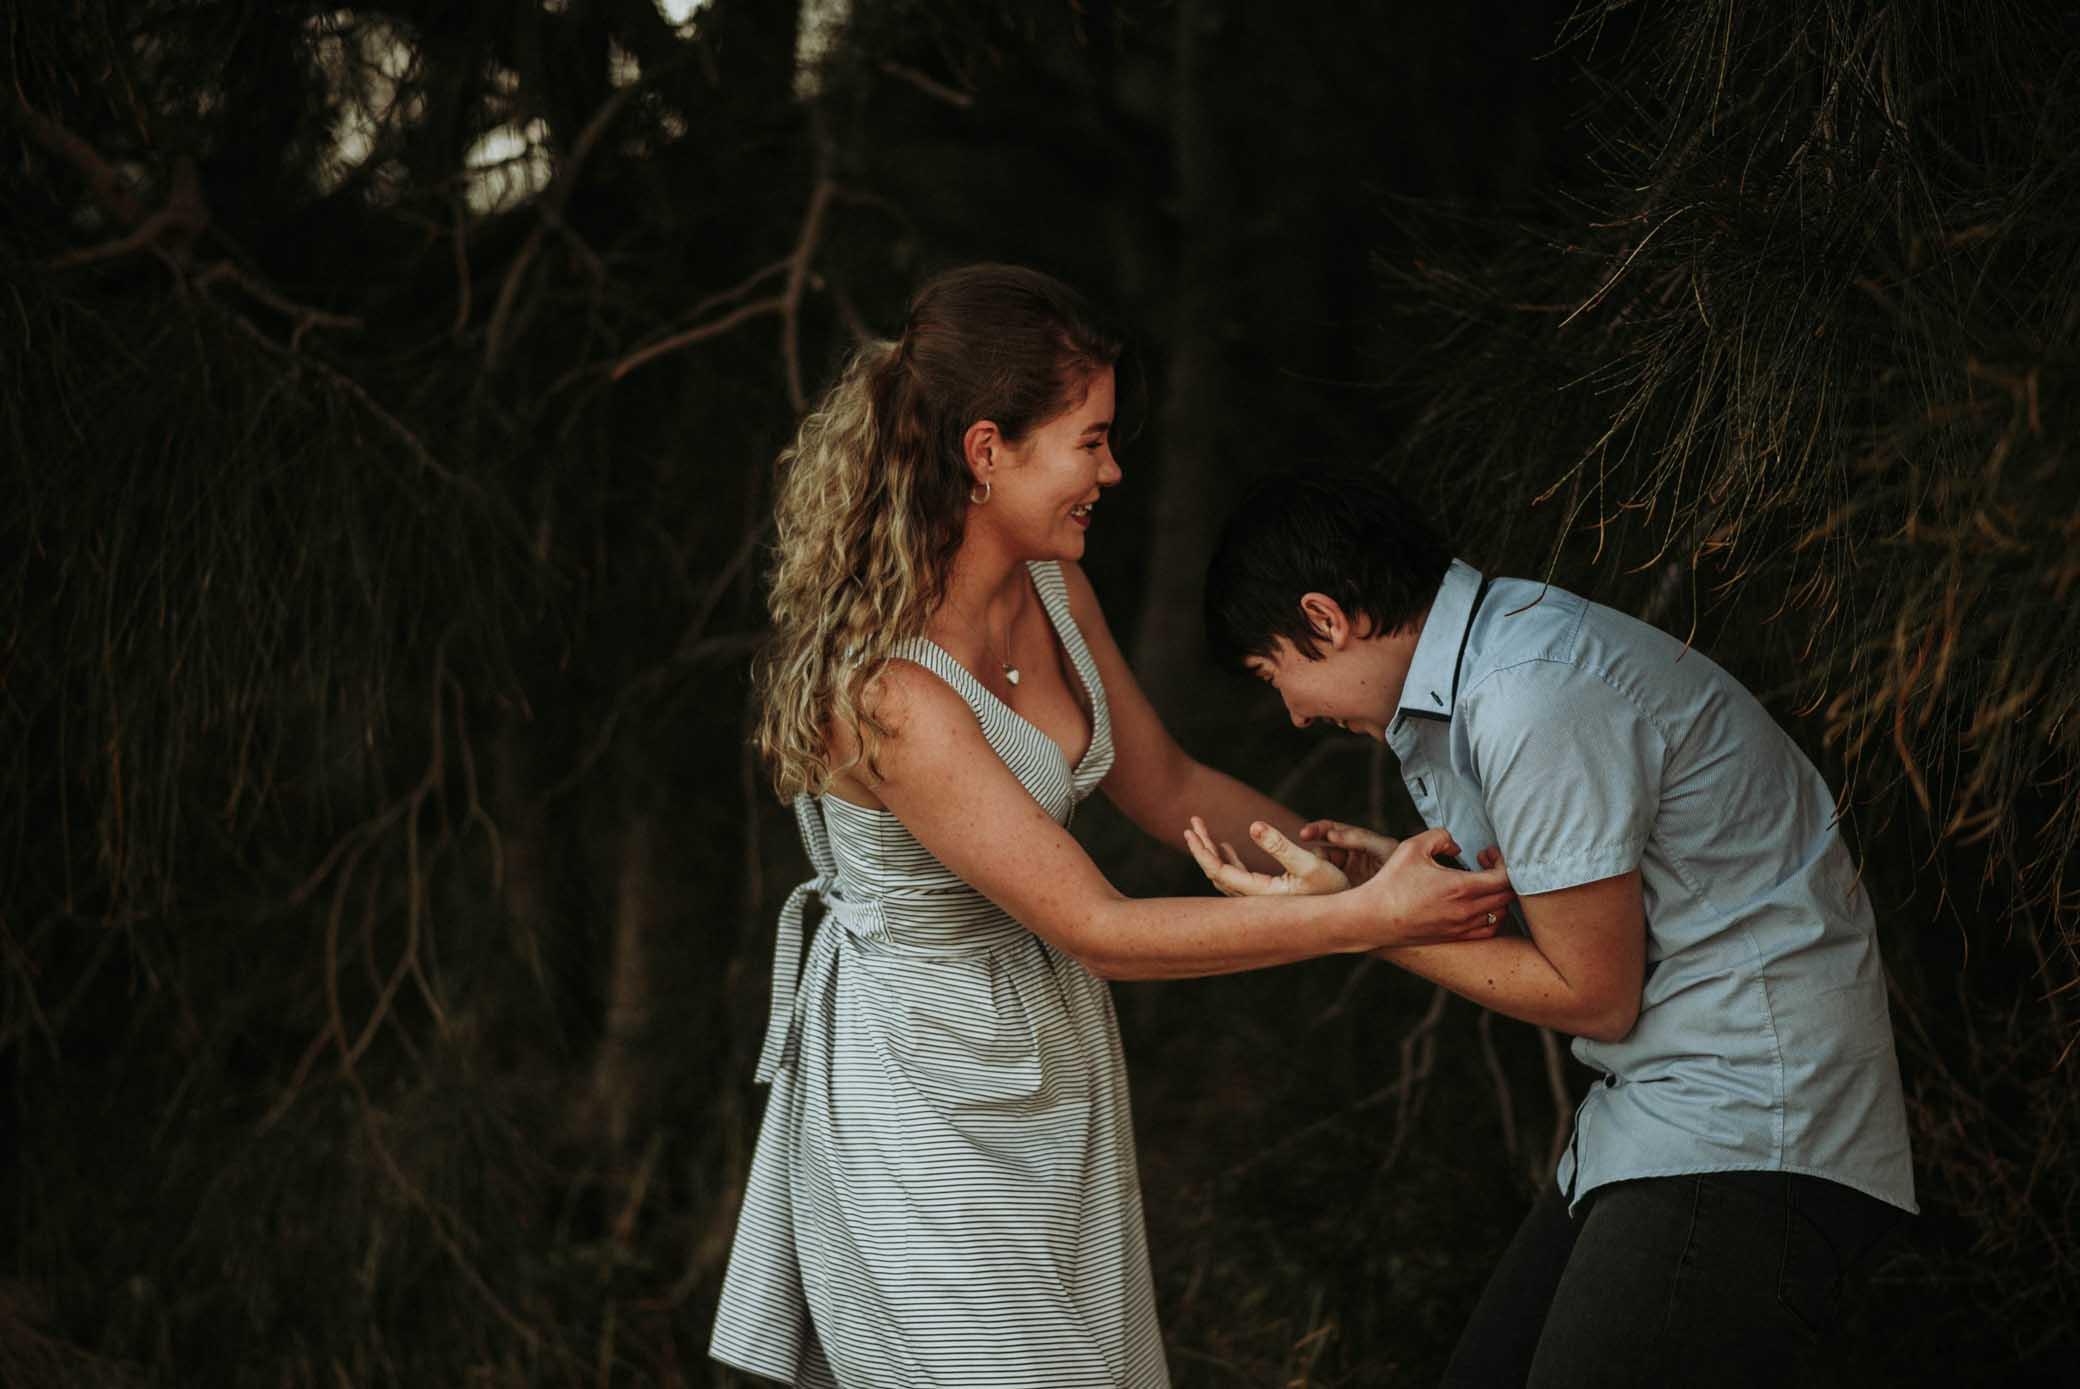 Translucent Photography LBGTIQ lesbian gay couple love photographer Dancing With Her Sydney Harbour Bridge Engagement